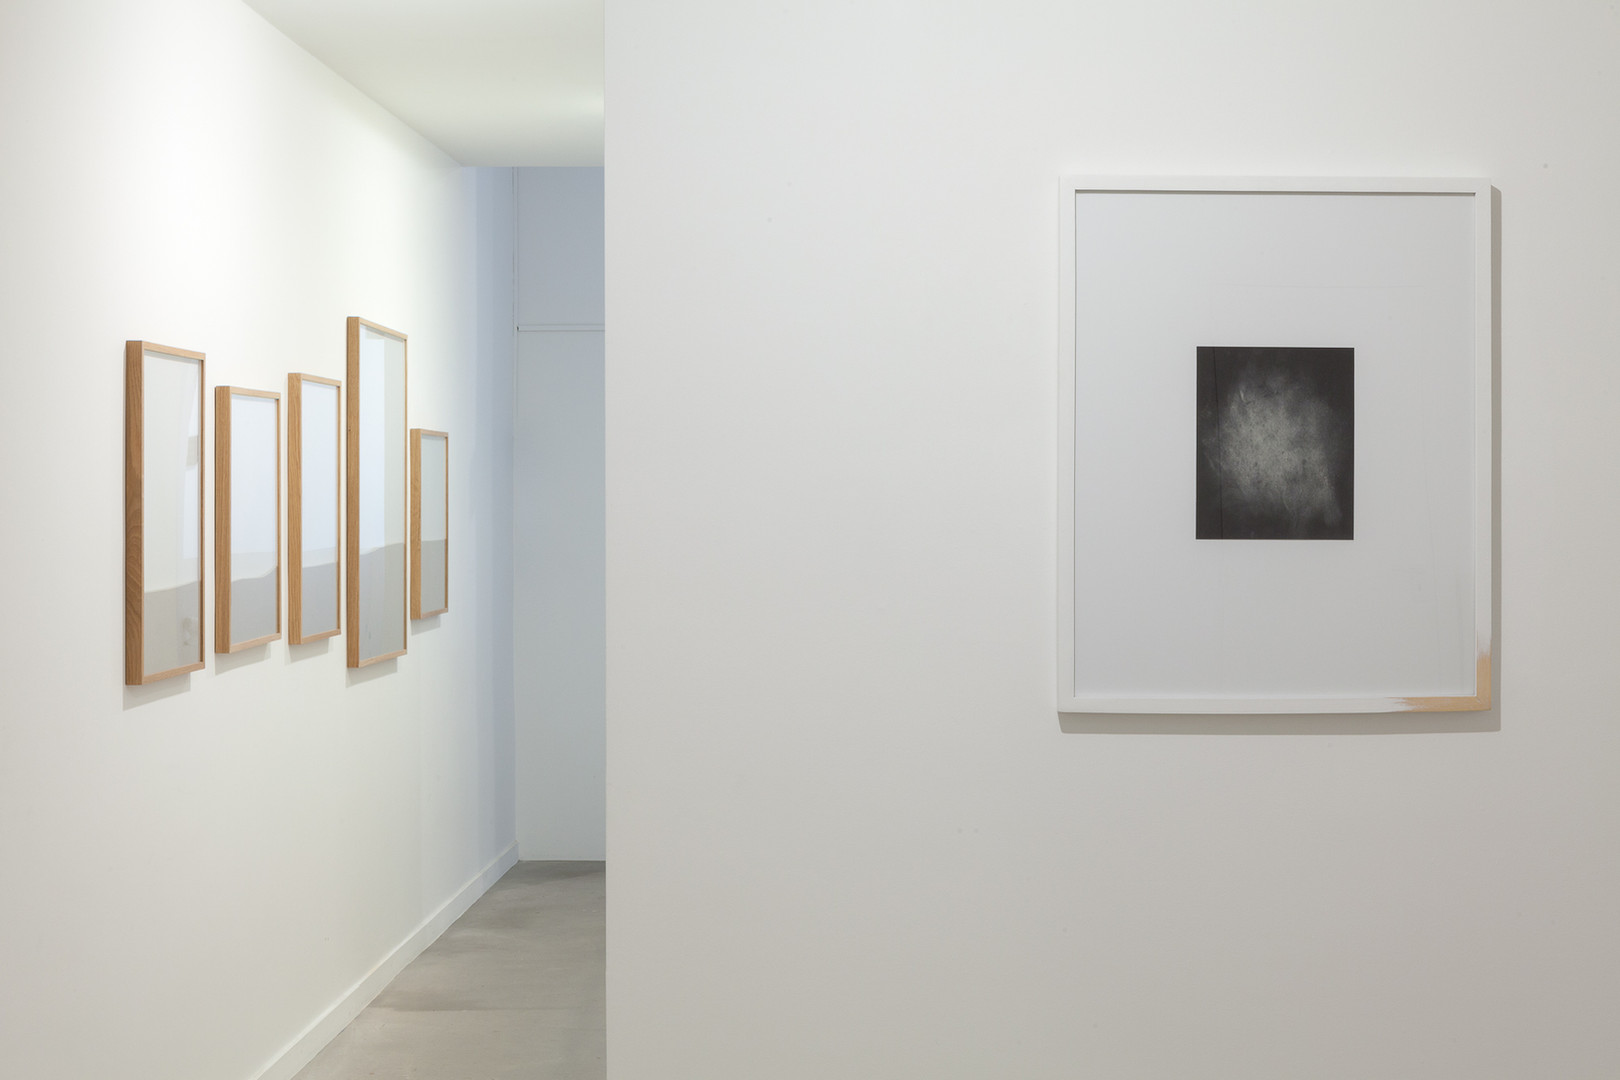 Interpretation of a corner